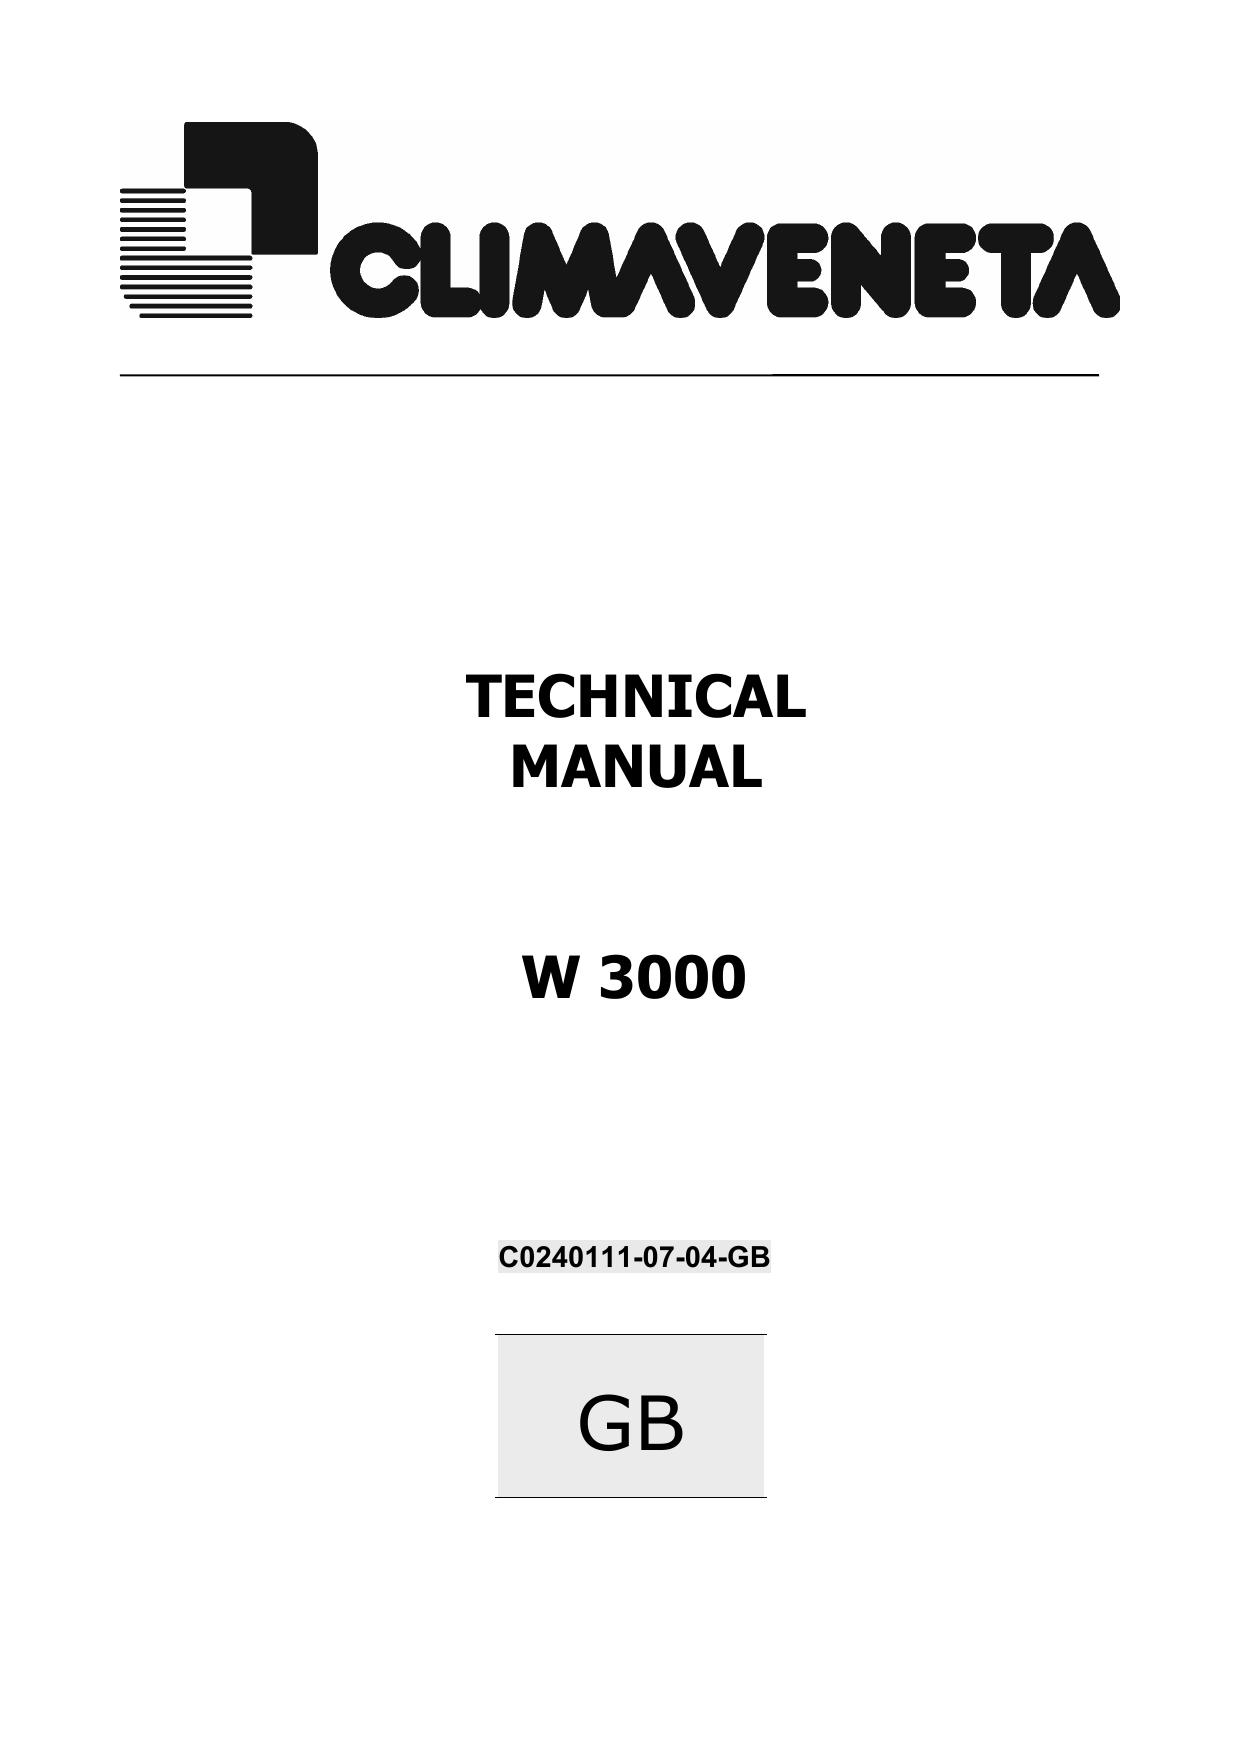 TECHNICAL MANUAL W 3000 | manualzz com